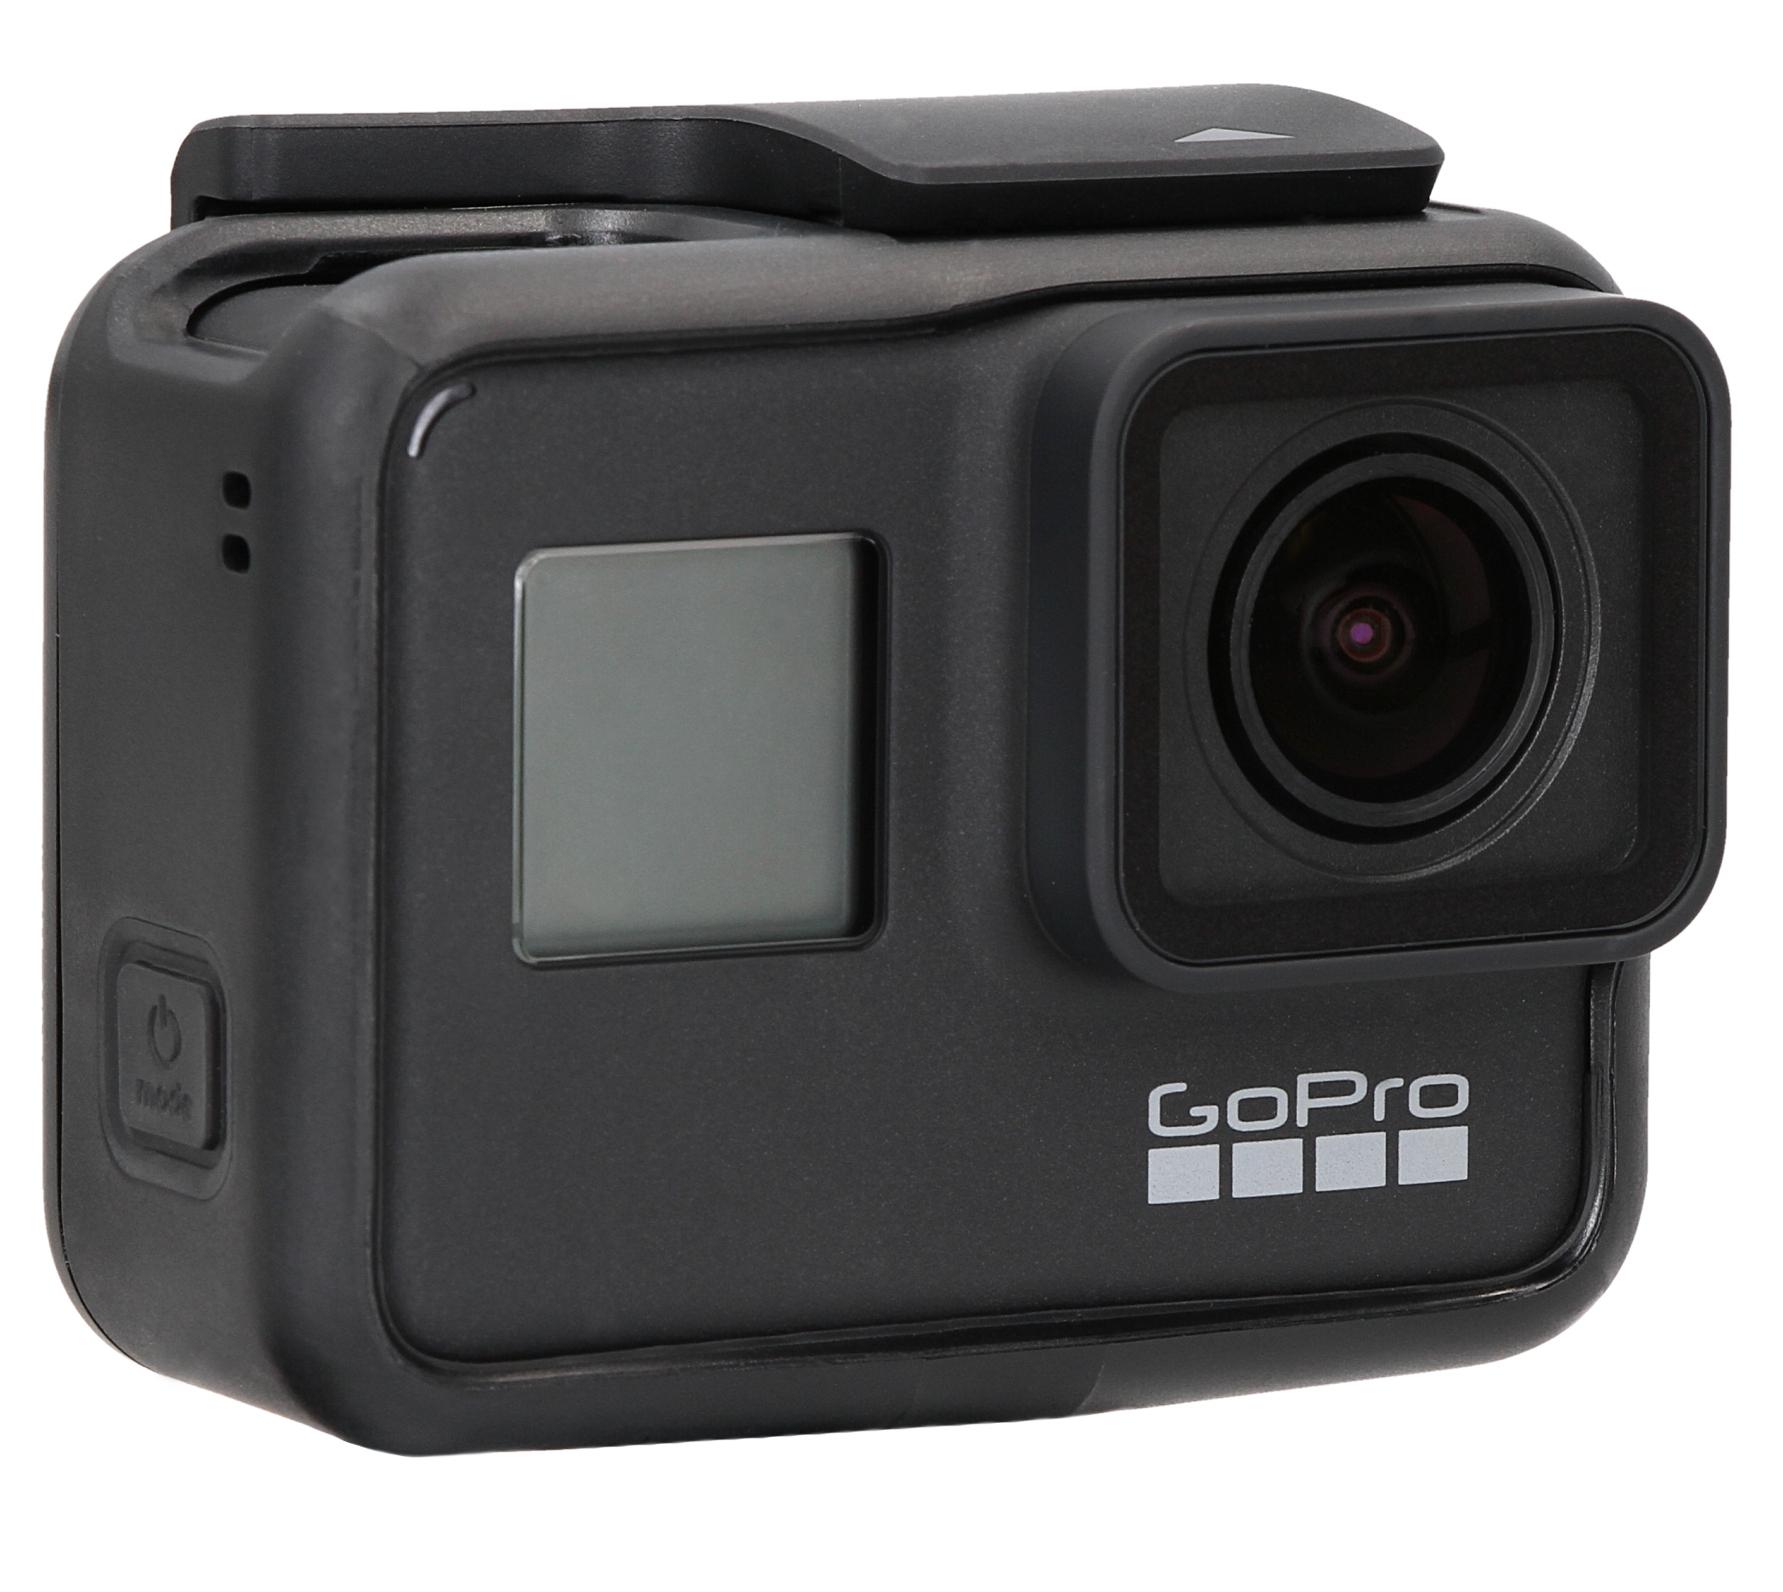 GoPro Hero 7 Black (CHDHX701RW)